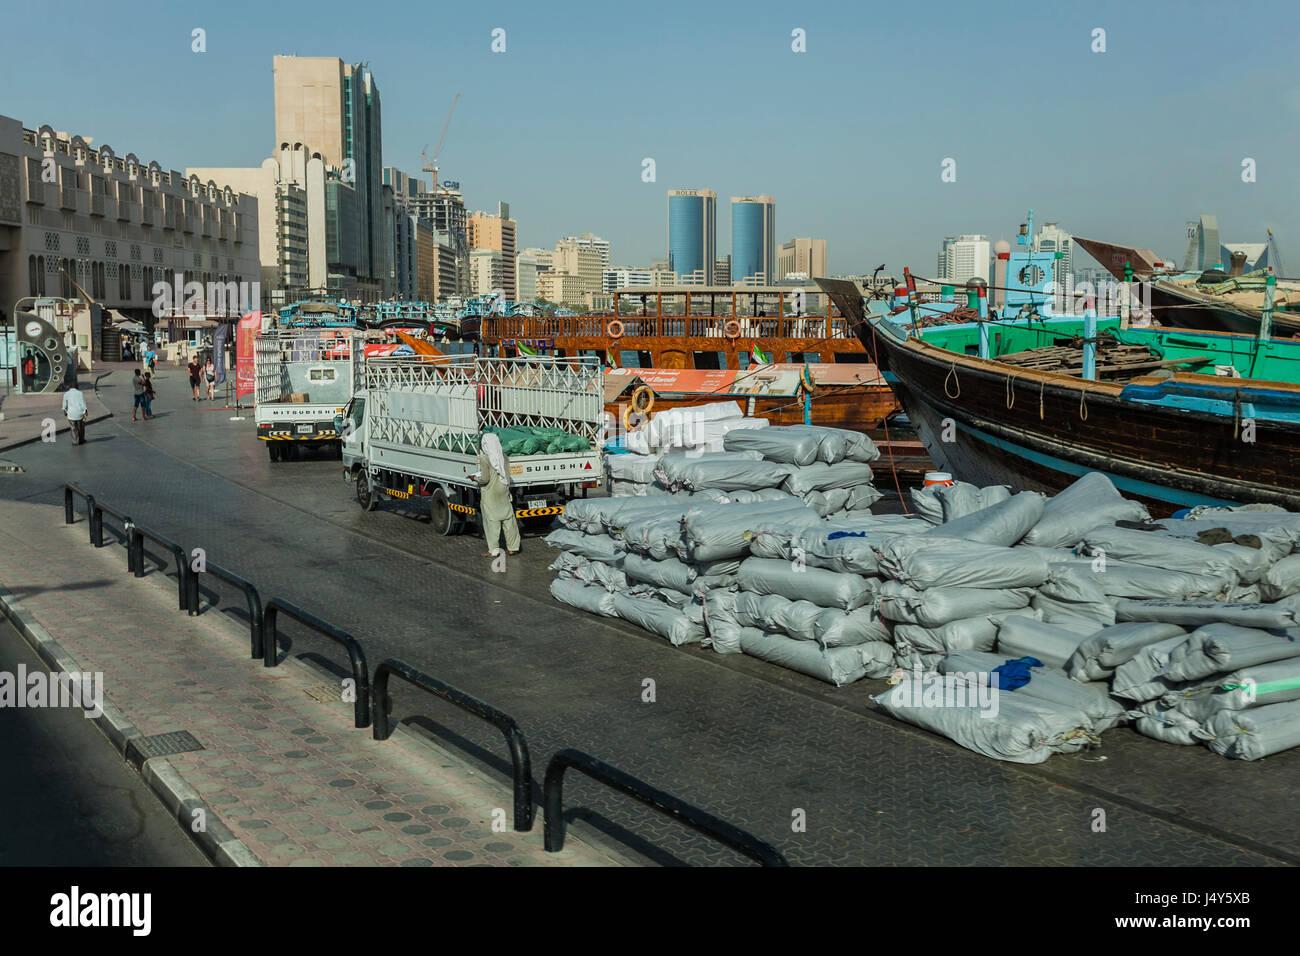 DOWNTOWN DUBAI,DUBAI, UAE-16TH AUG 2015:-Dubai is an ultra modern city alongside old world town Stock Photo